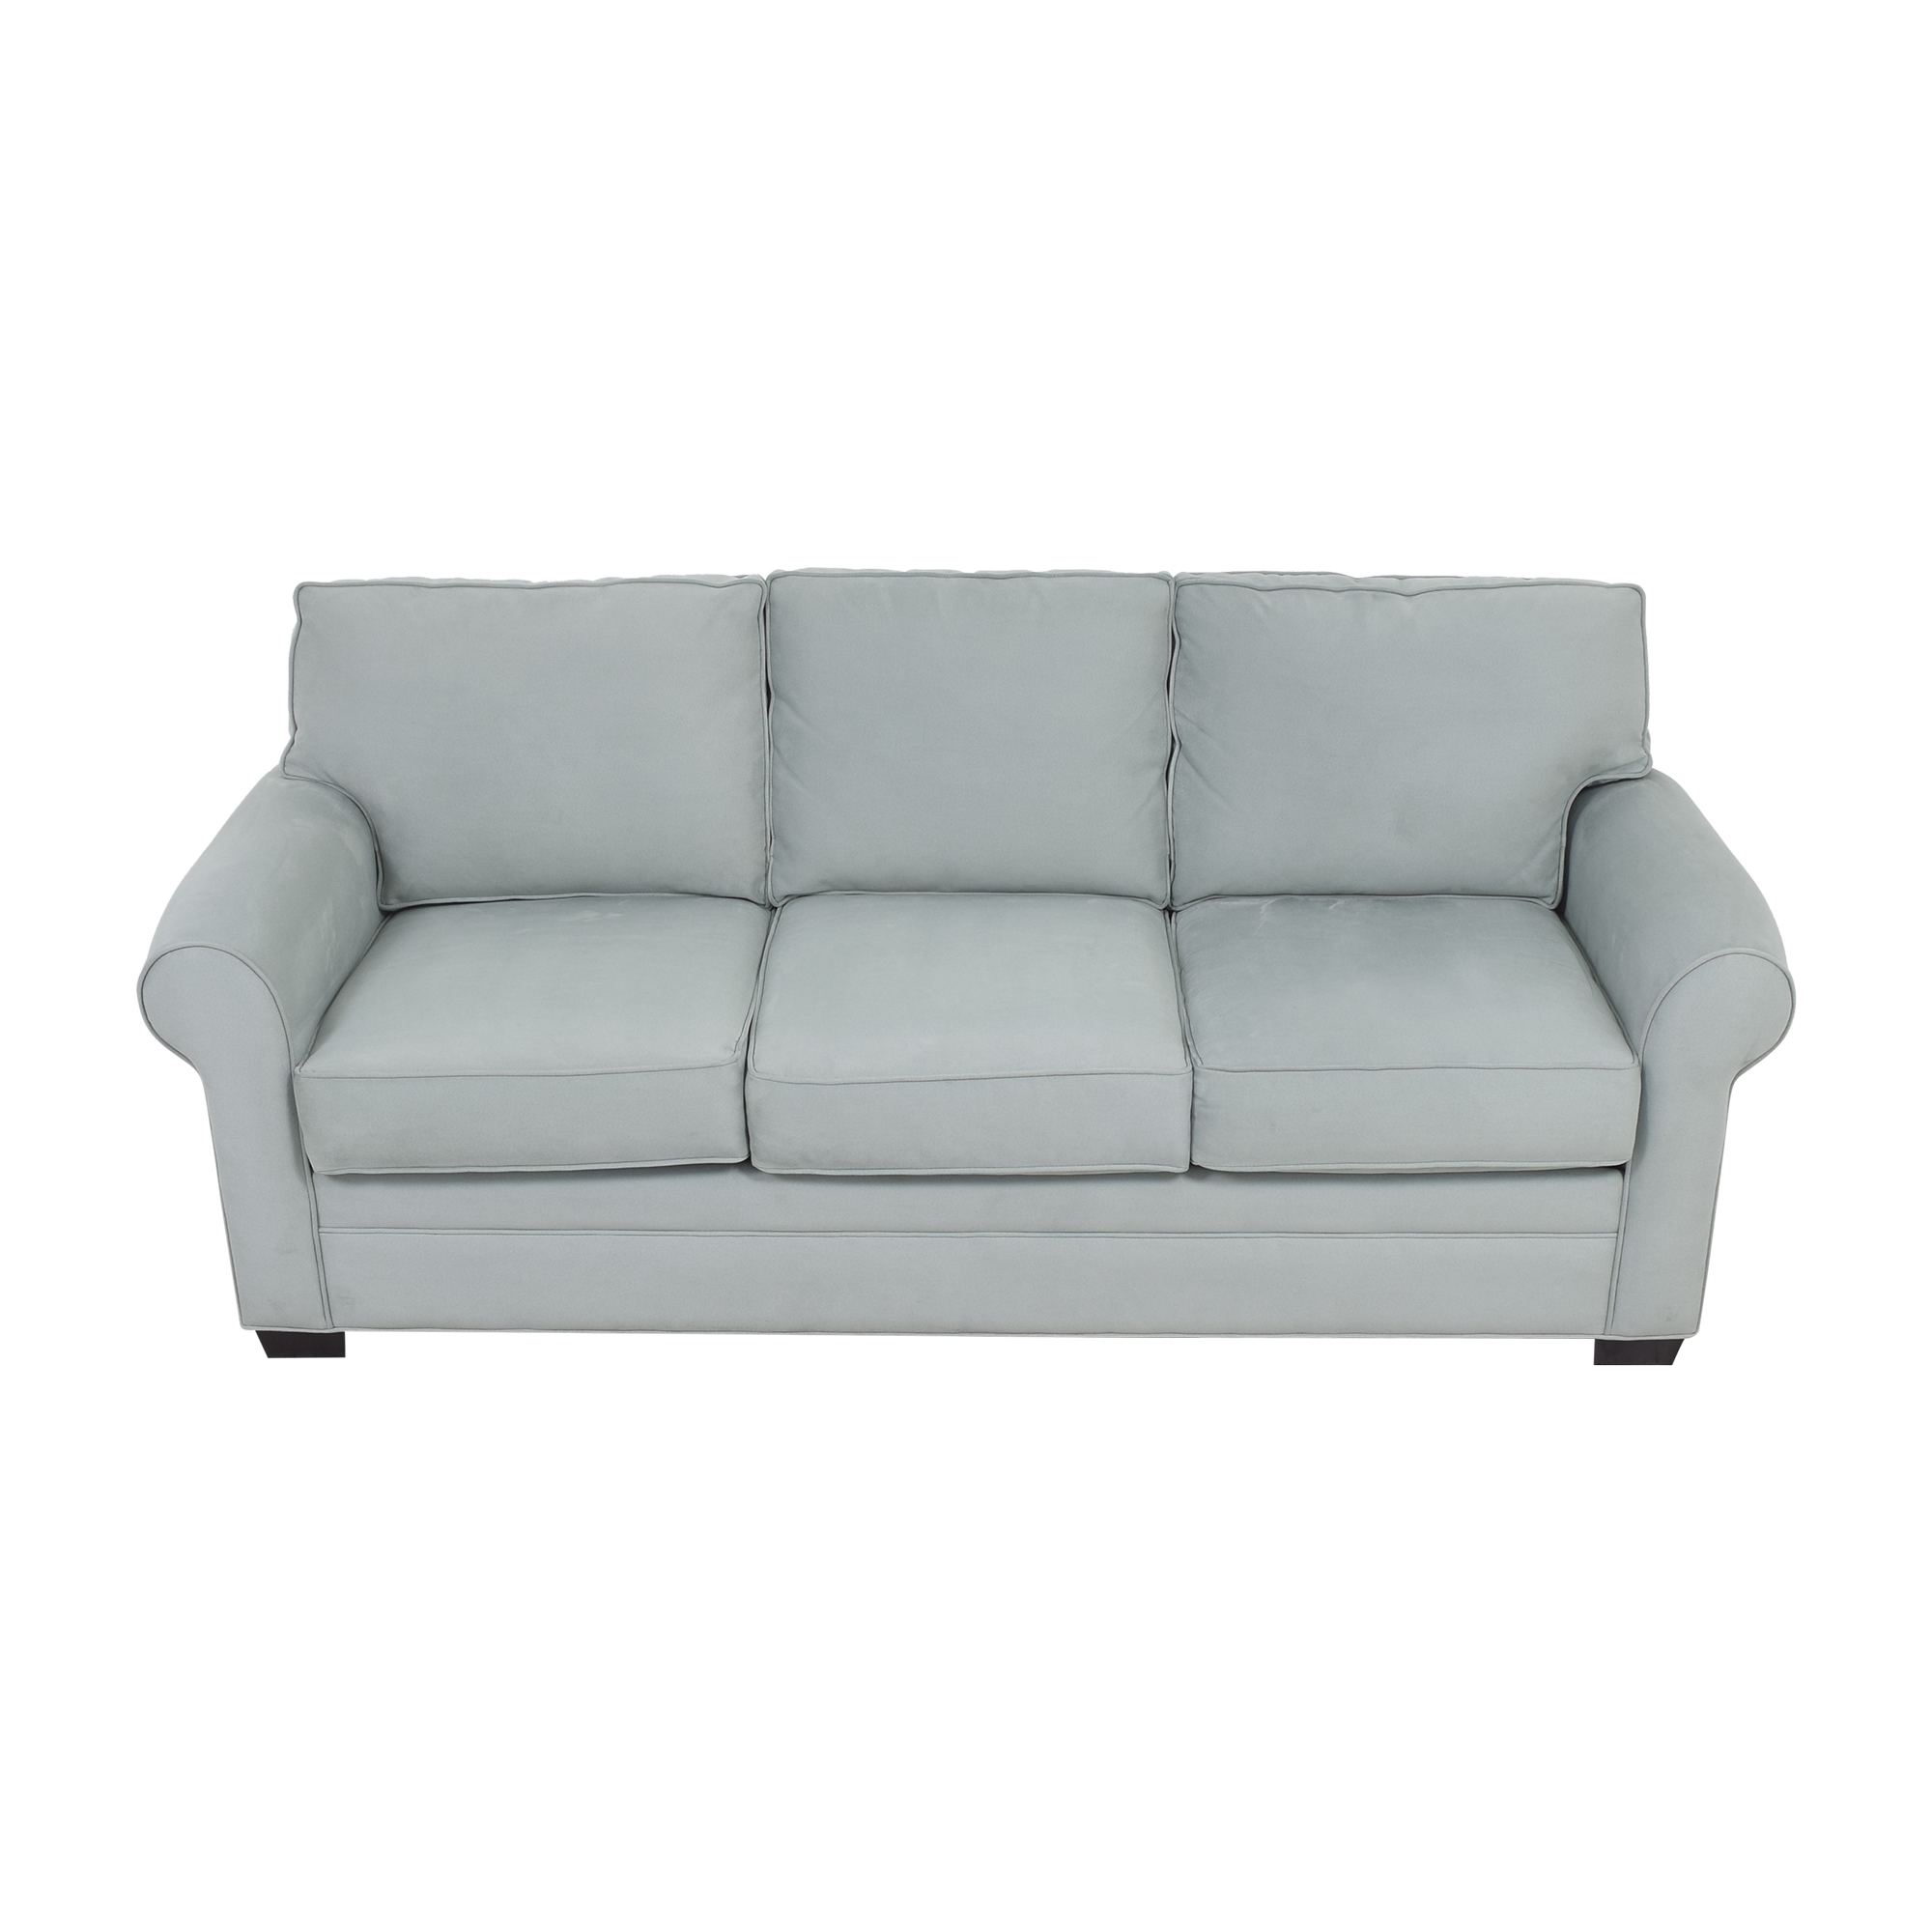 Raymour & Flanigan Raymour & Flanigan Cindy Crawford Home Roll Arm Sofa used